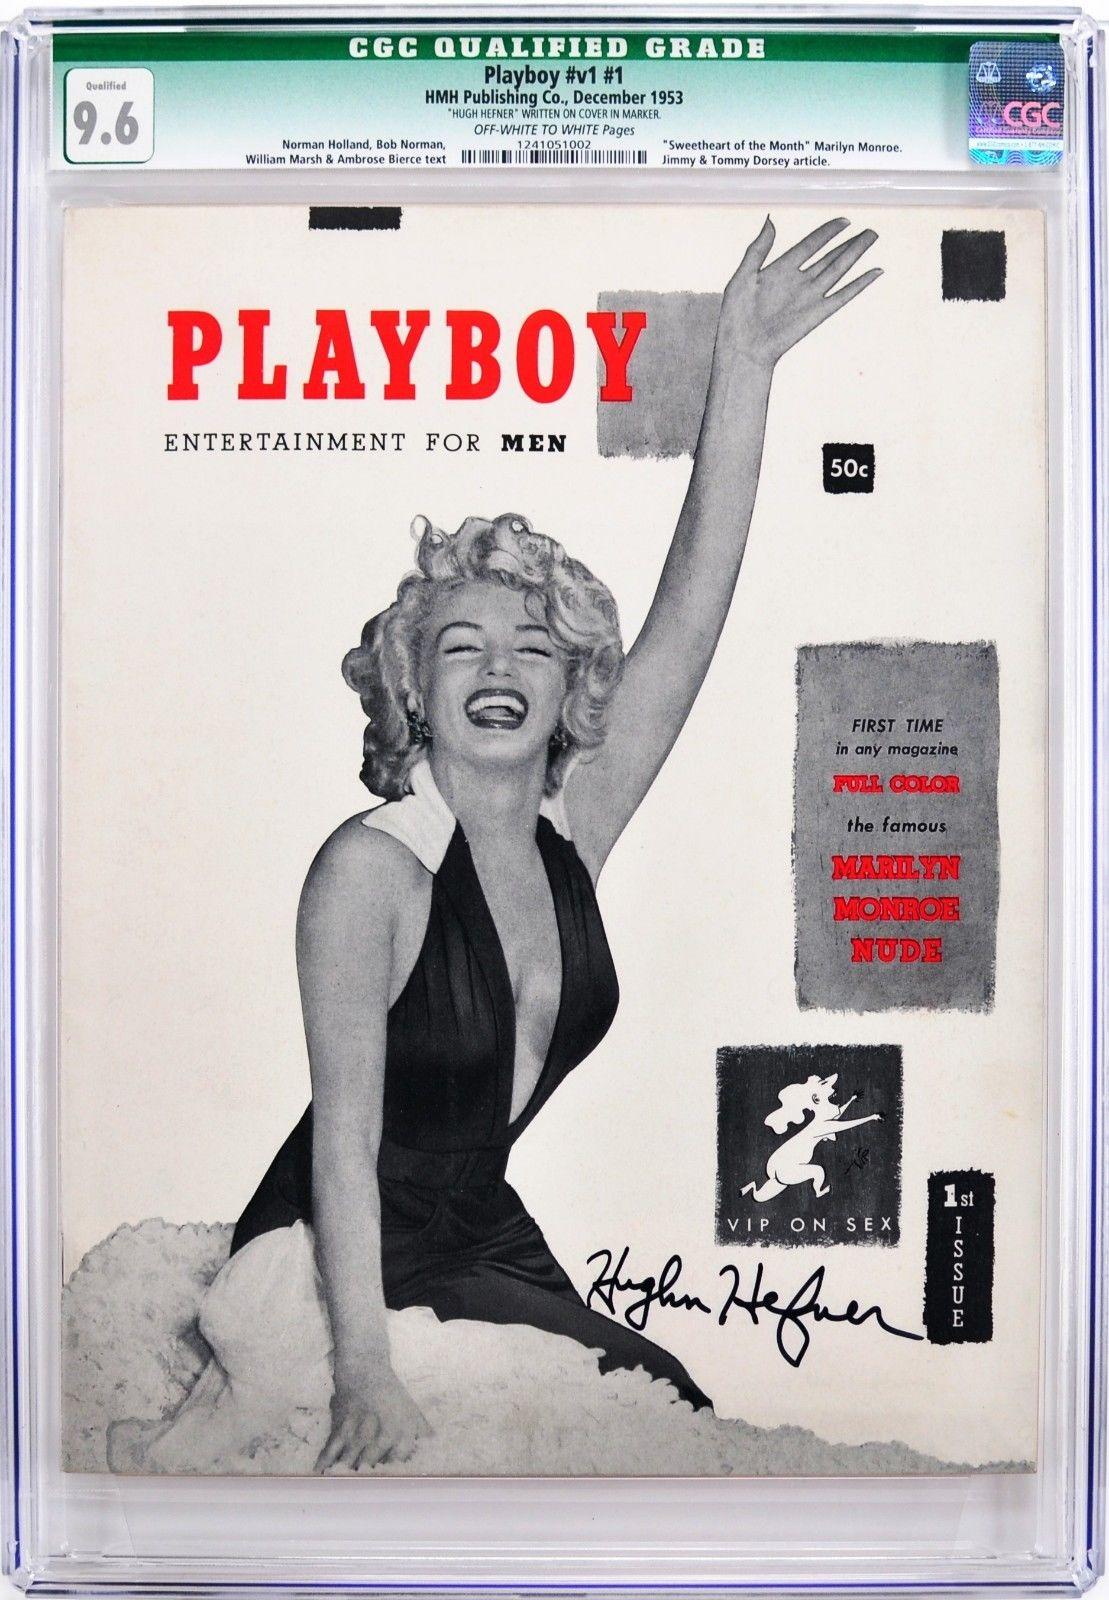 Playboy December 1953 | CGC 9.6 Near Mint + | Signed by Hugh Hefner | JSA LOA